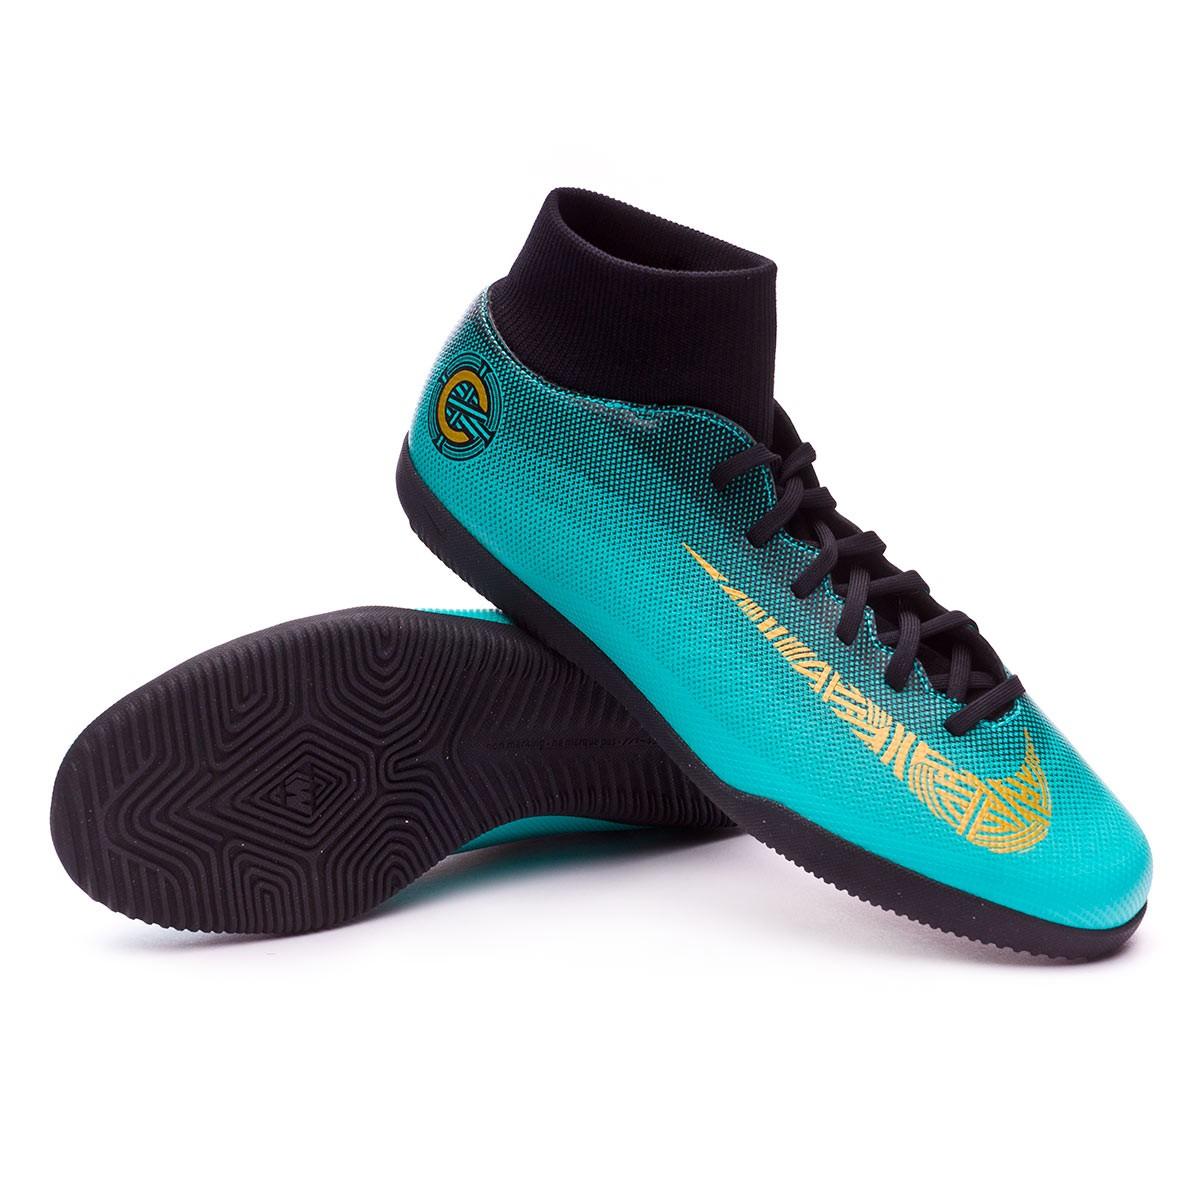 c3ac187f091c2 Futsal Boot Nike Mercurial SuperflyX VI Club CR7 IC Clear jade ...